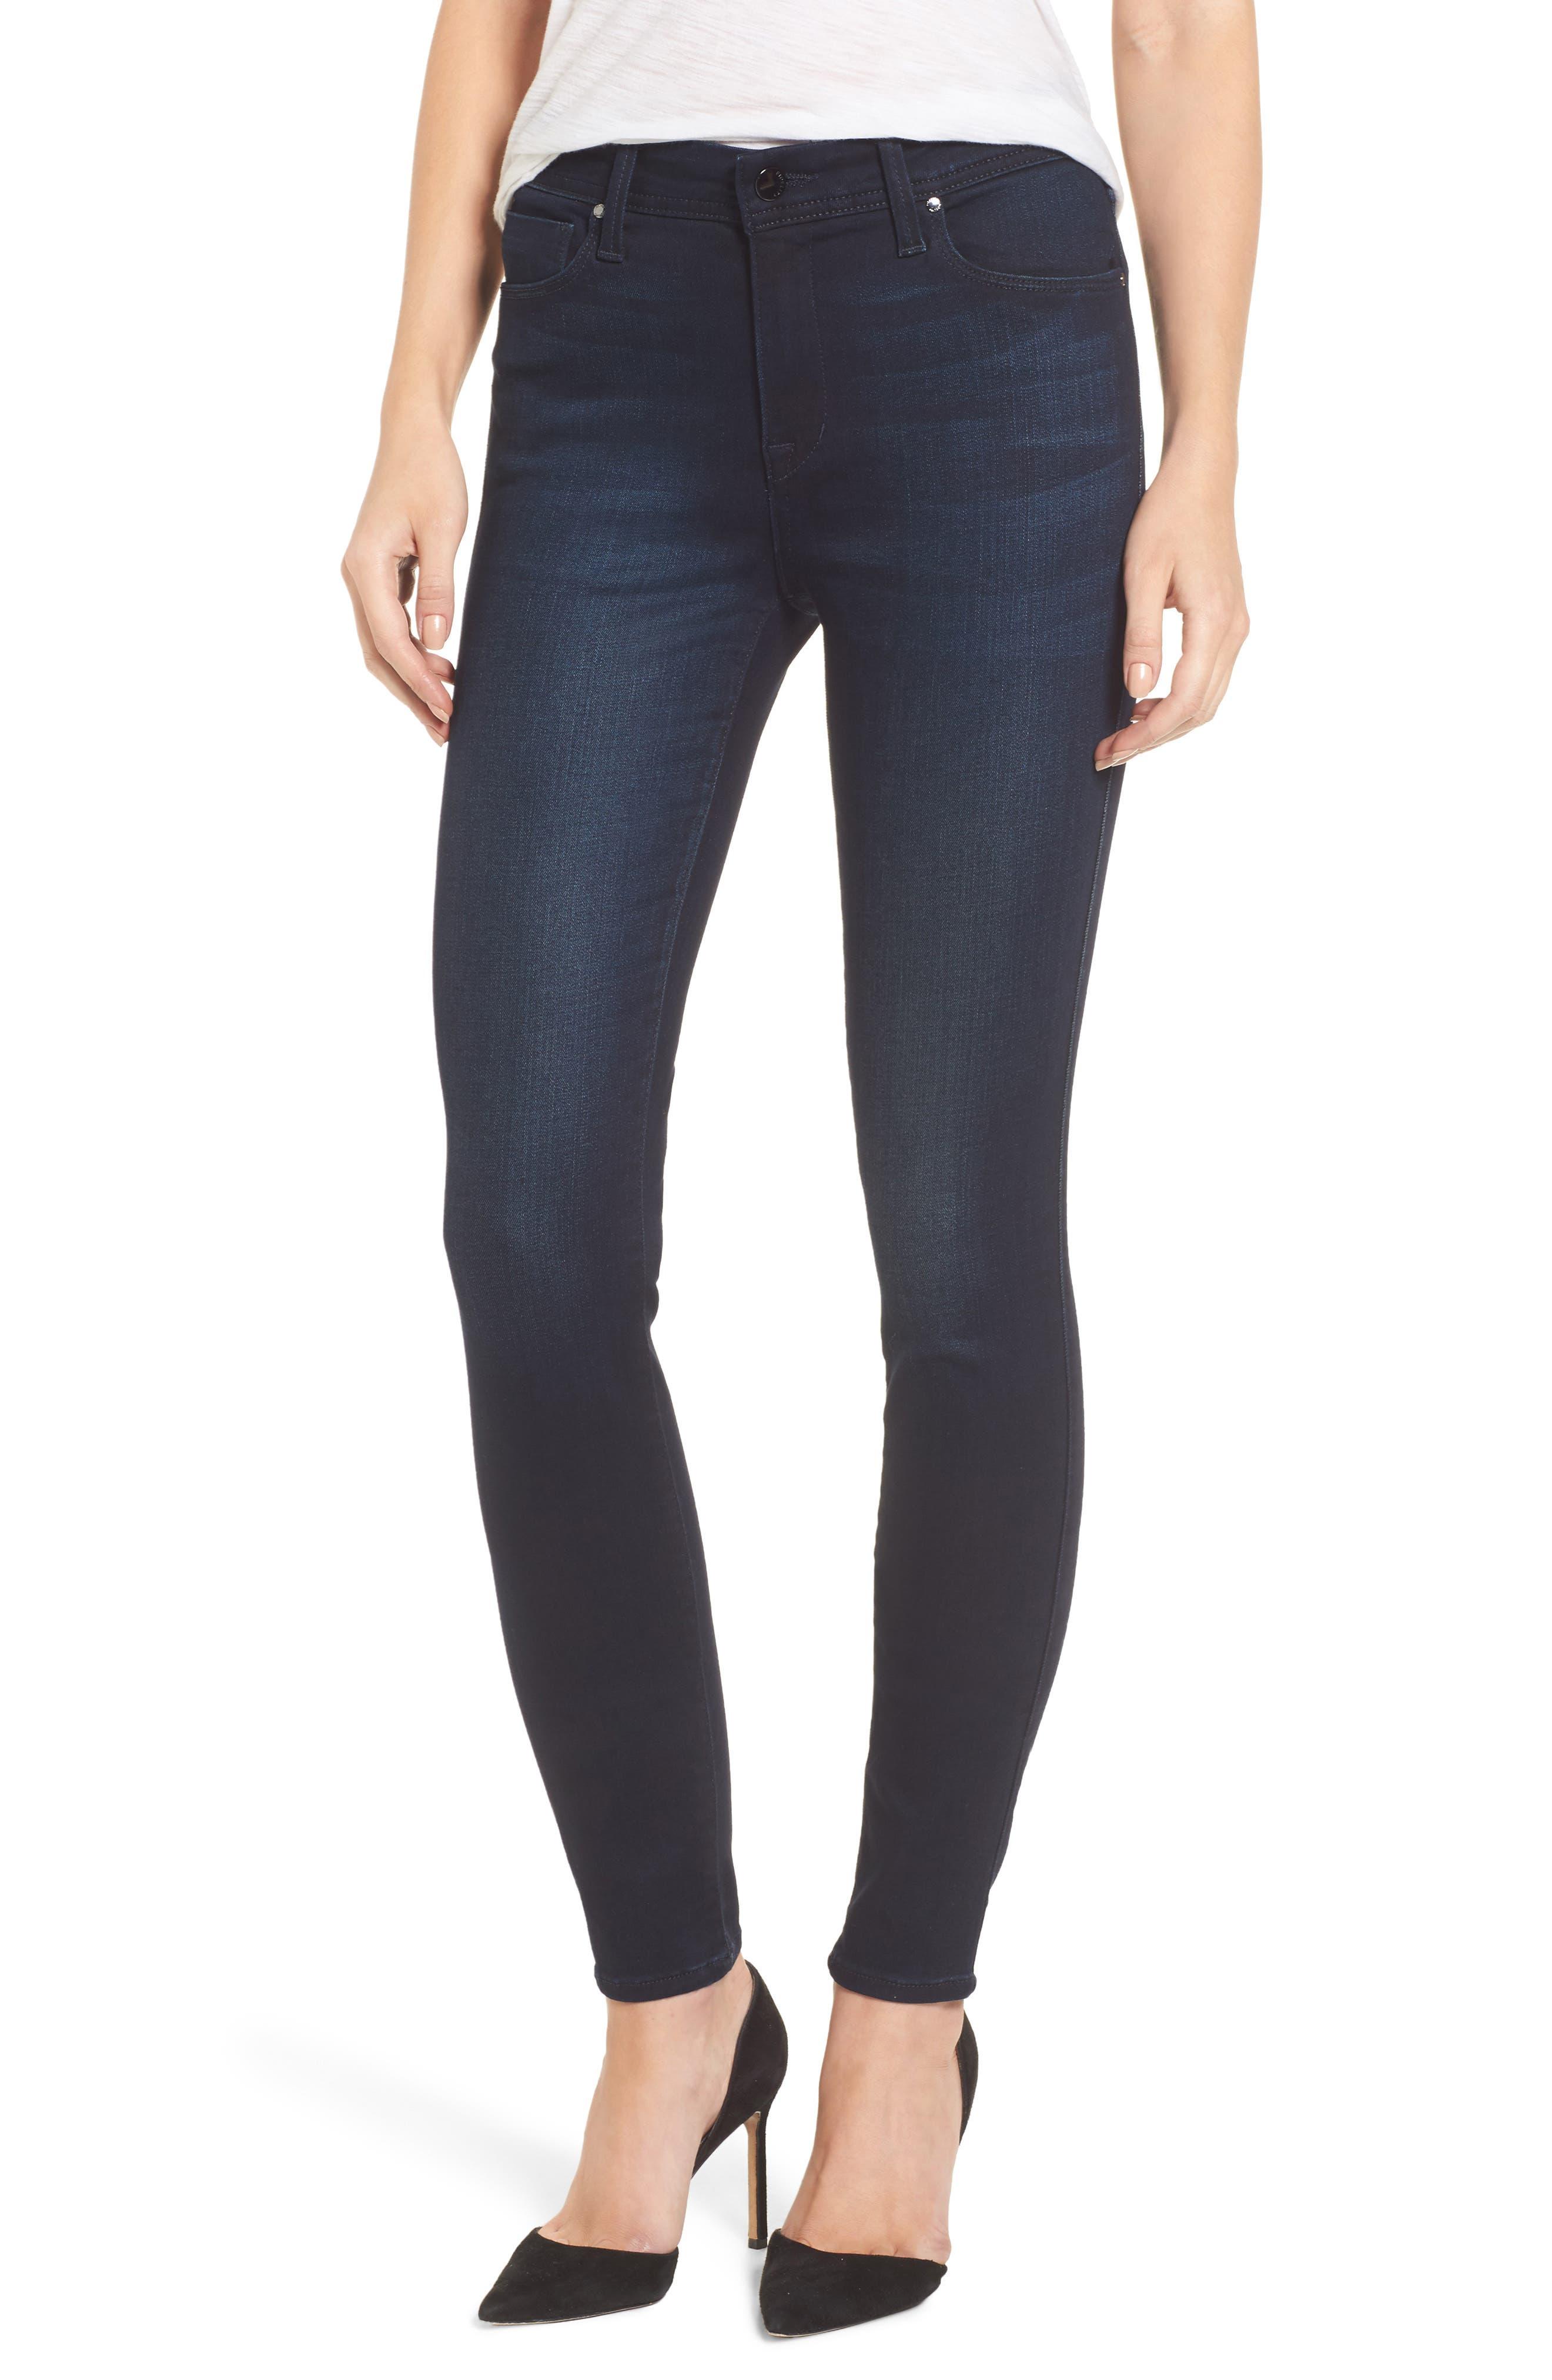 Fidelity Jeans Belvedere Skinny Jeans,                         Main,                         color, 400